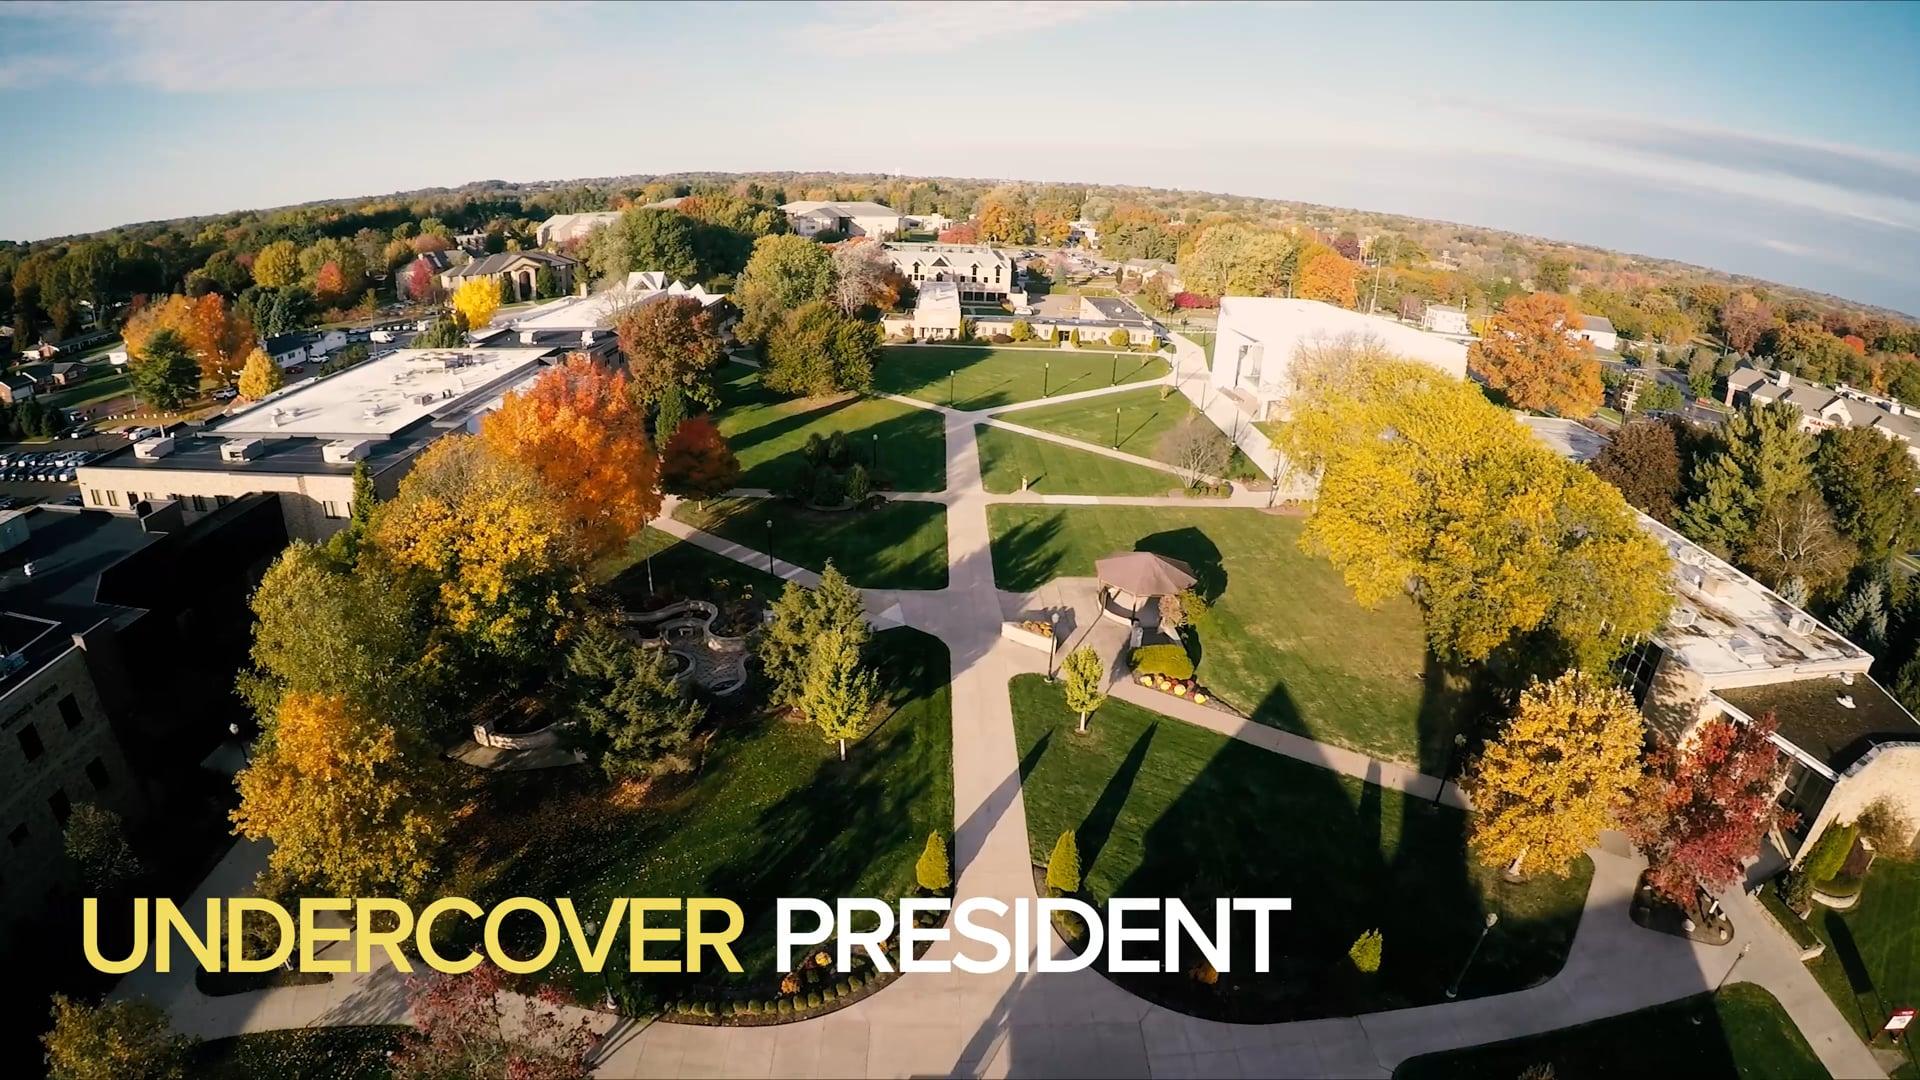 Walsh University: Undercover President